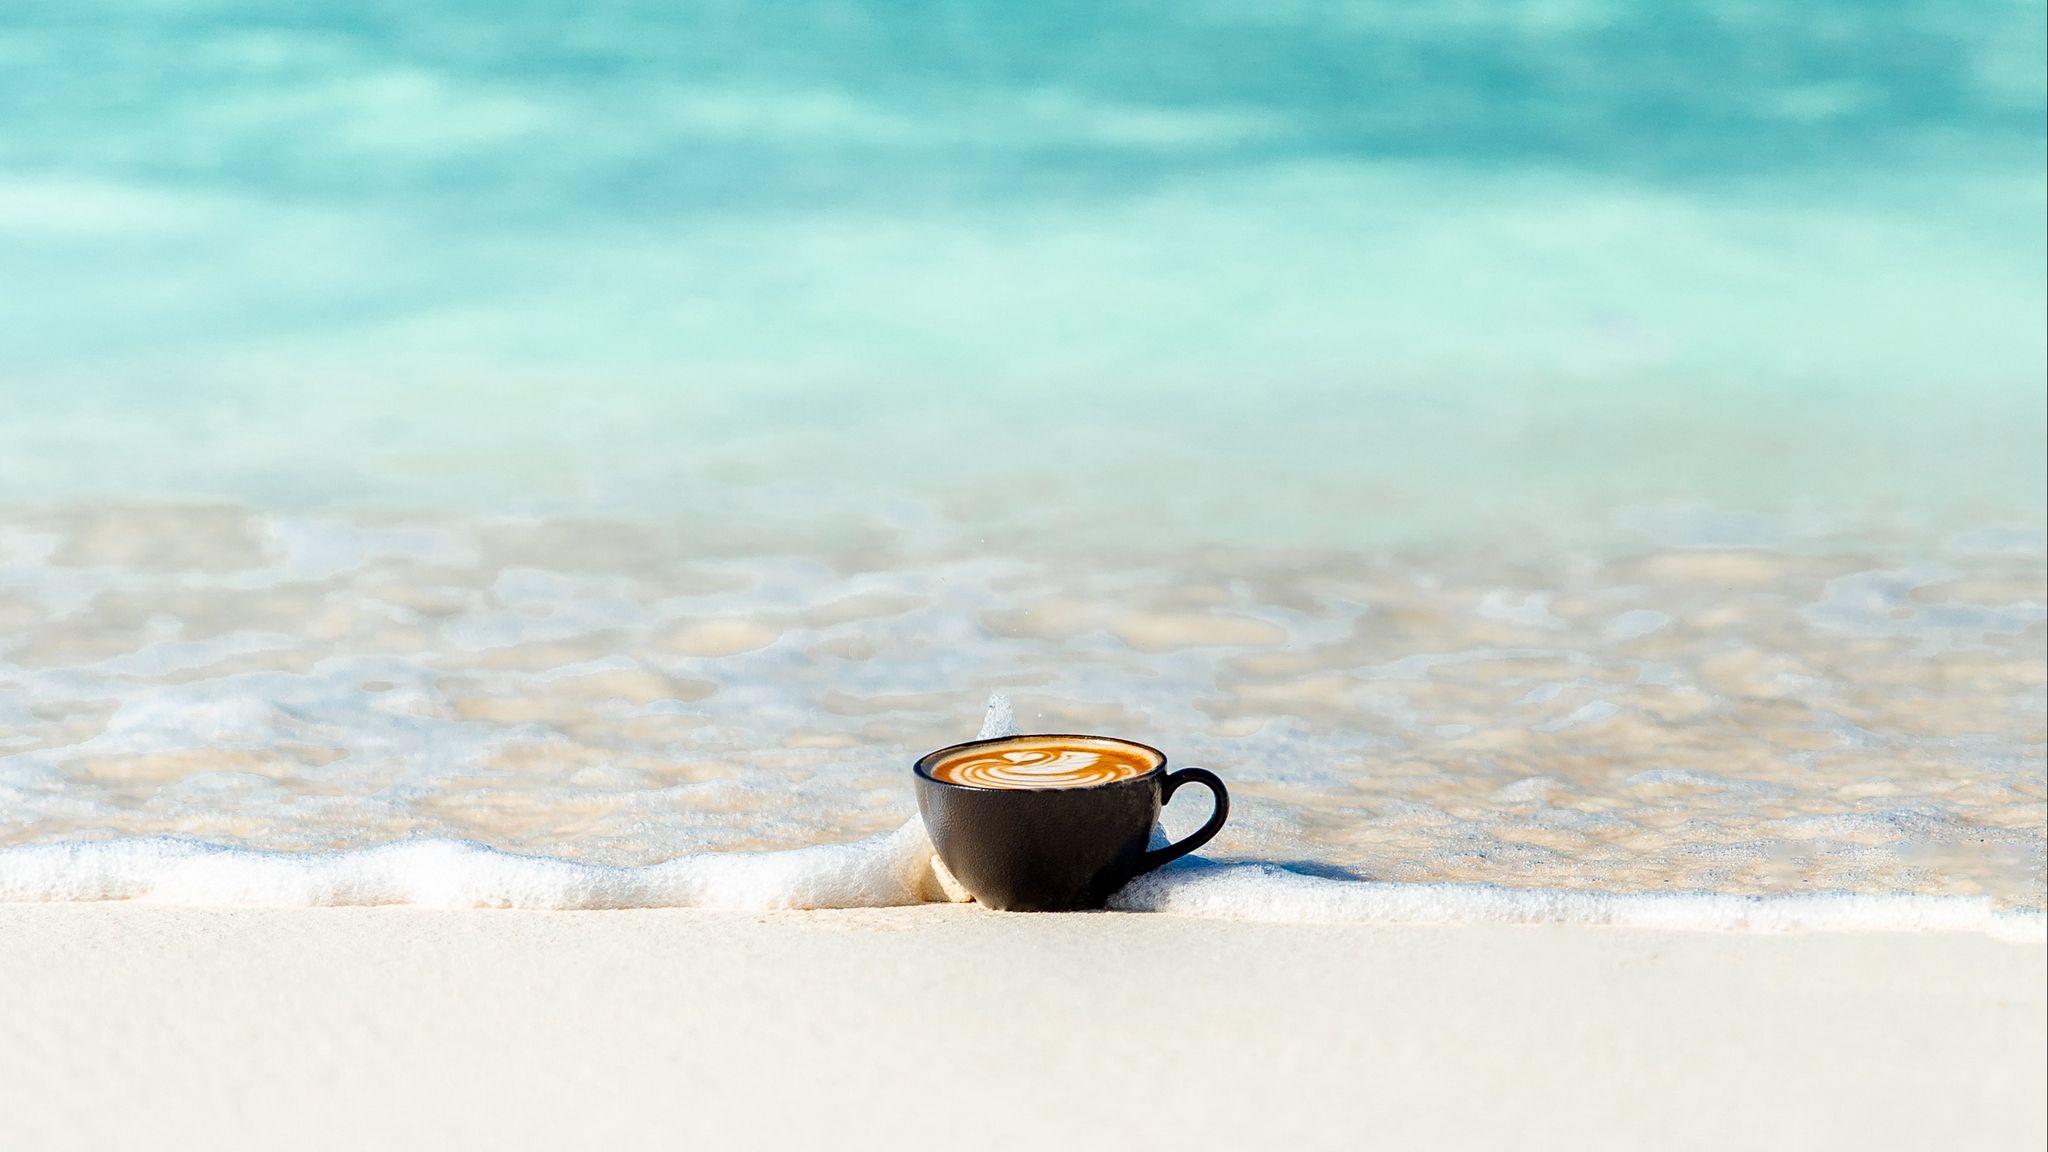 2048x1152 Wallpaper cup, ocean, sand, coast, minimalism